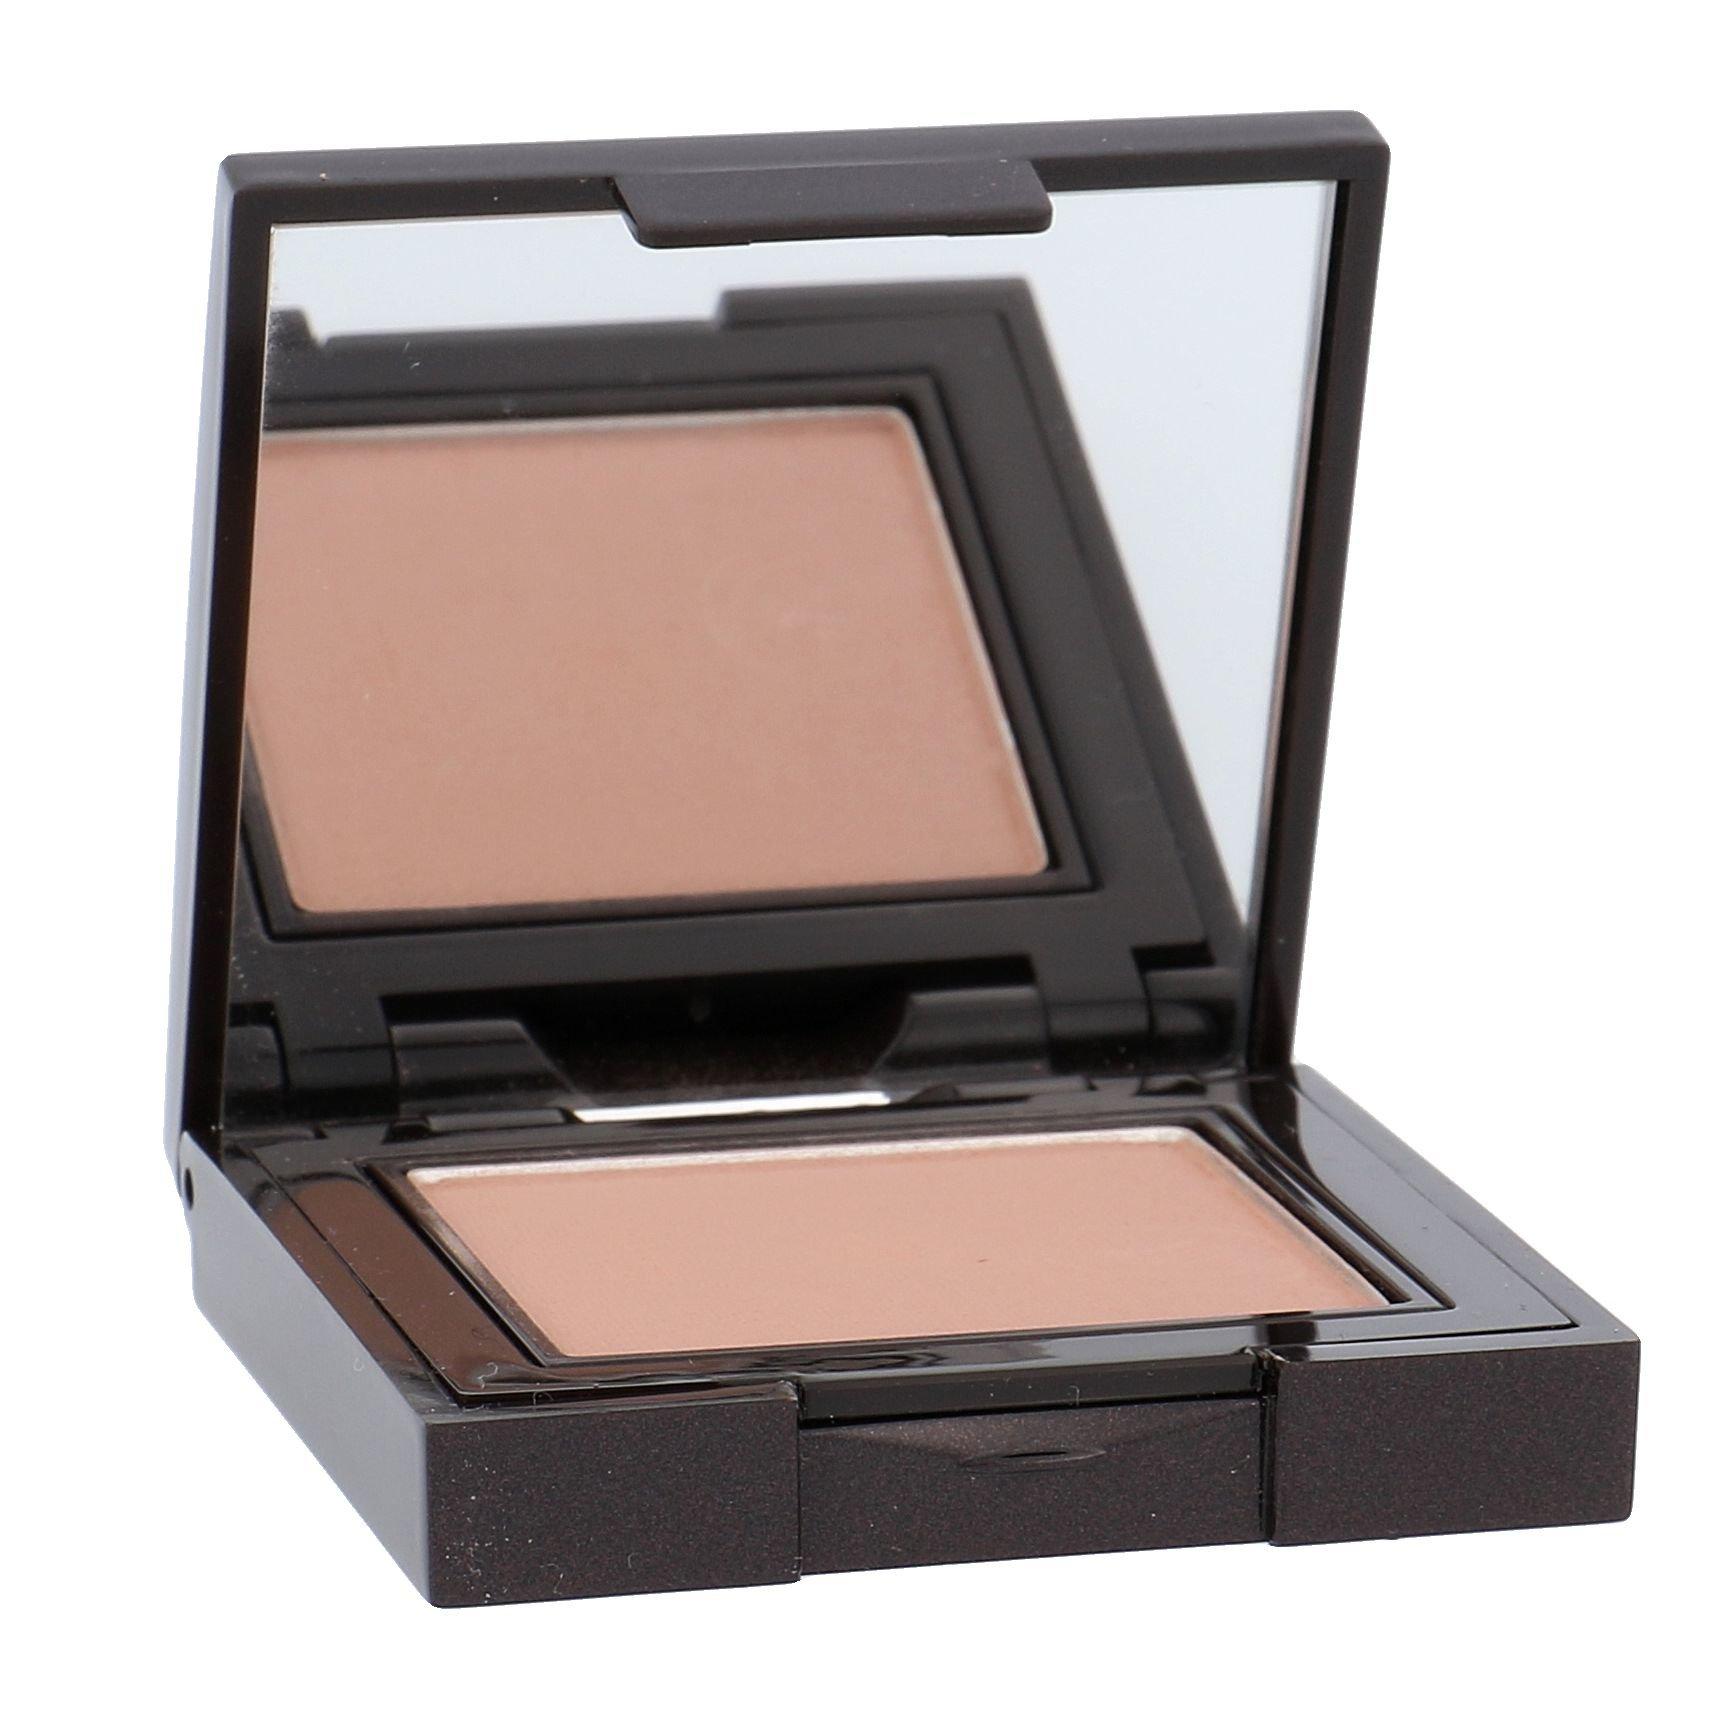 Laura Mercier Second Skin Cheek Colour Cosmetic 3,6ml Wild Bouquet